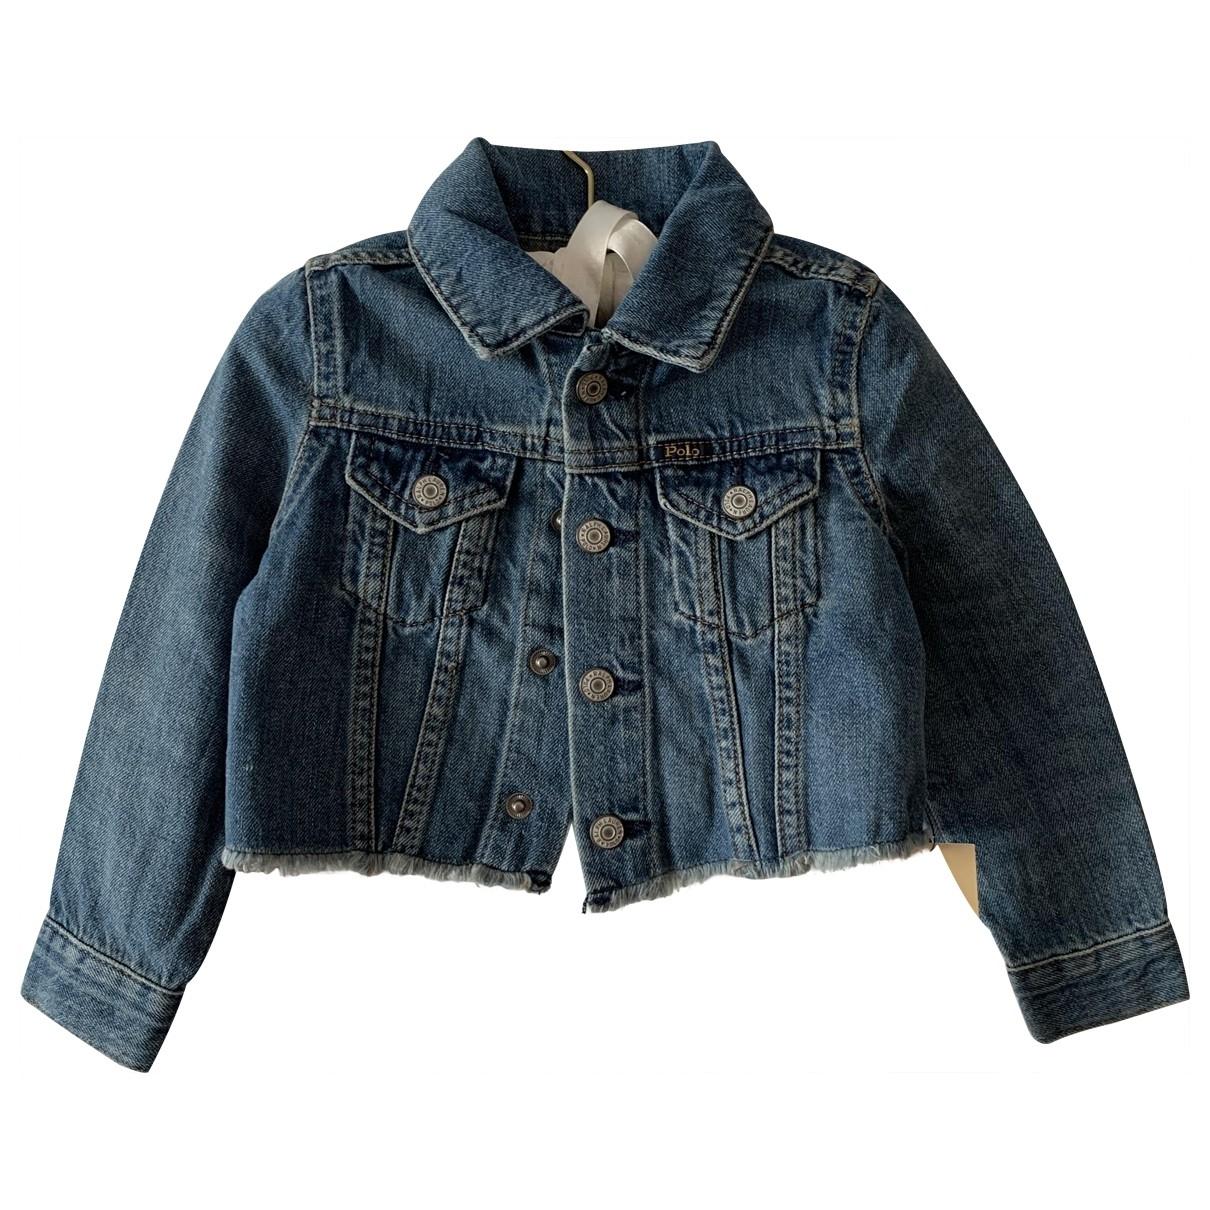 Polo Ralph Lauren \N Jacke, Maentel in  Blau Denim - Jeans